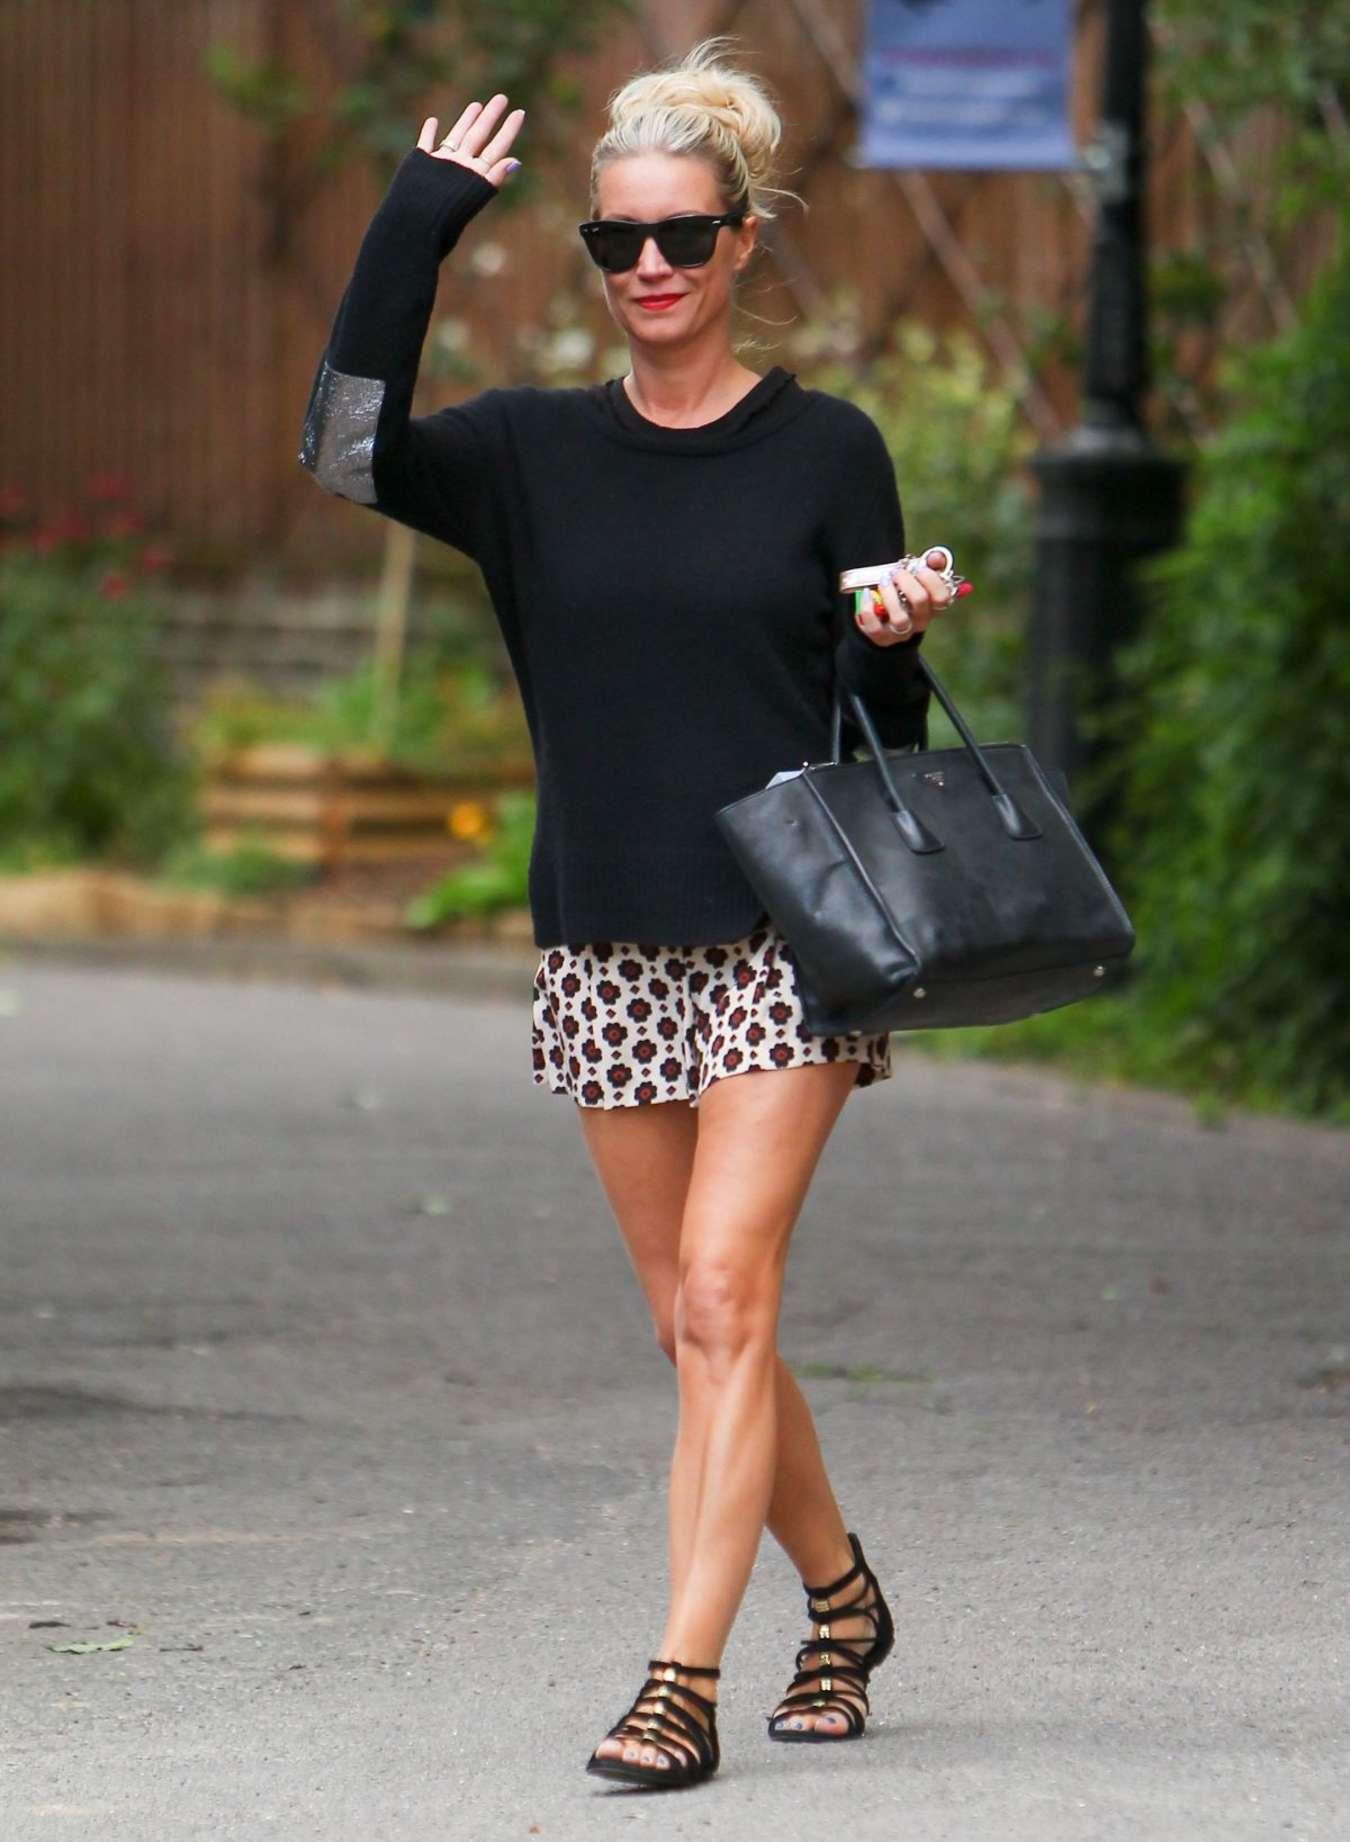 Denise Van Outen in Mini Skirt Out in London